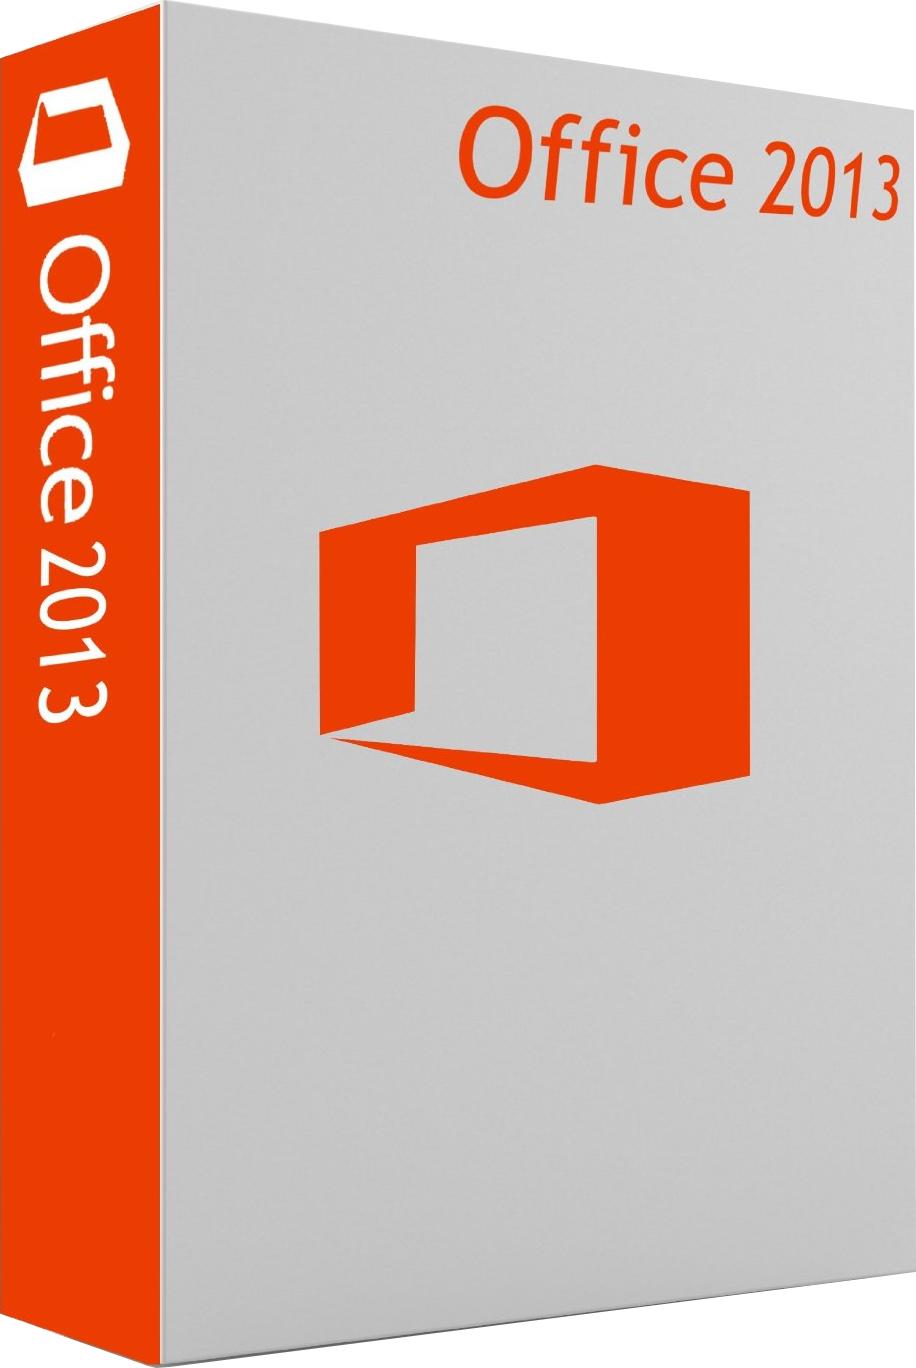 Microsoft Office Professional Plus 2013 Product Key Juankair Webster Lisensi Proffesional 2016